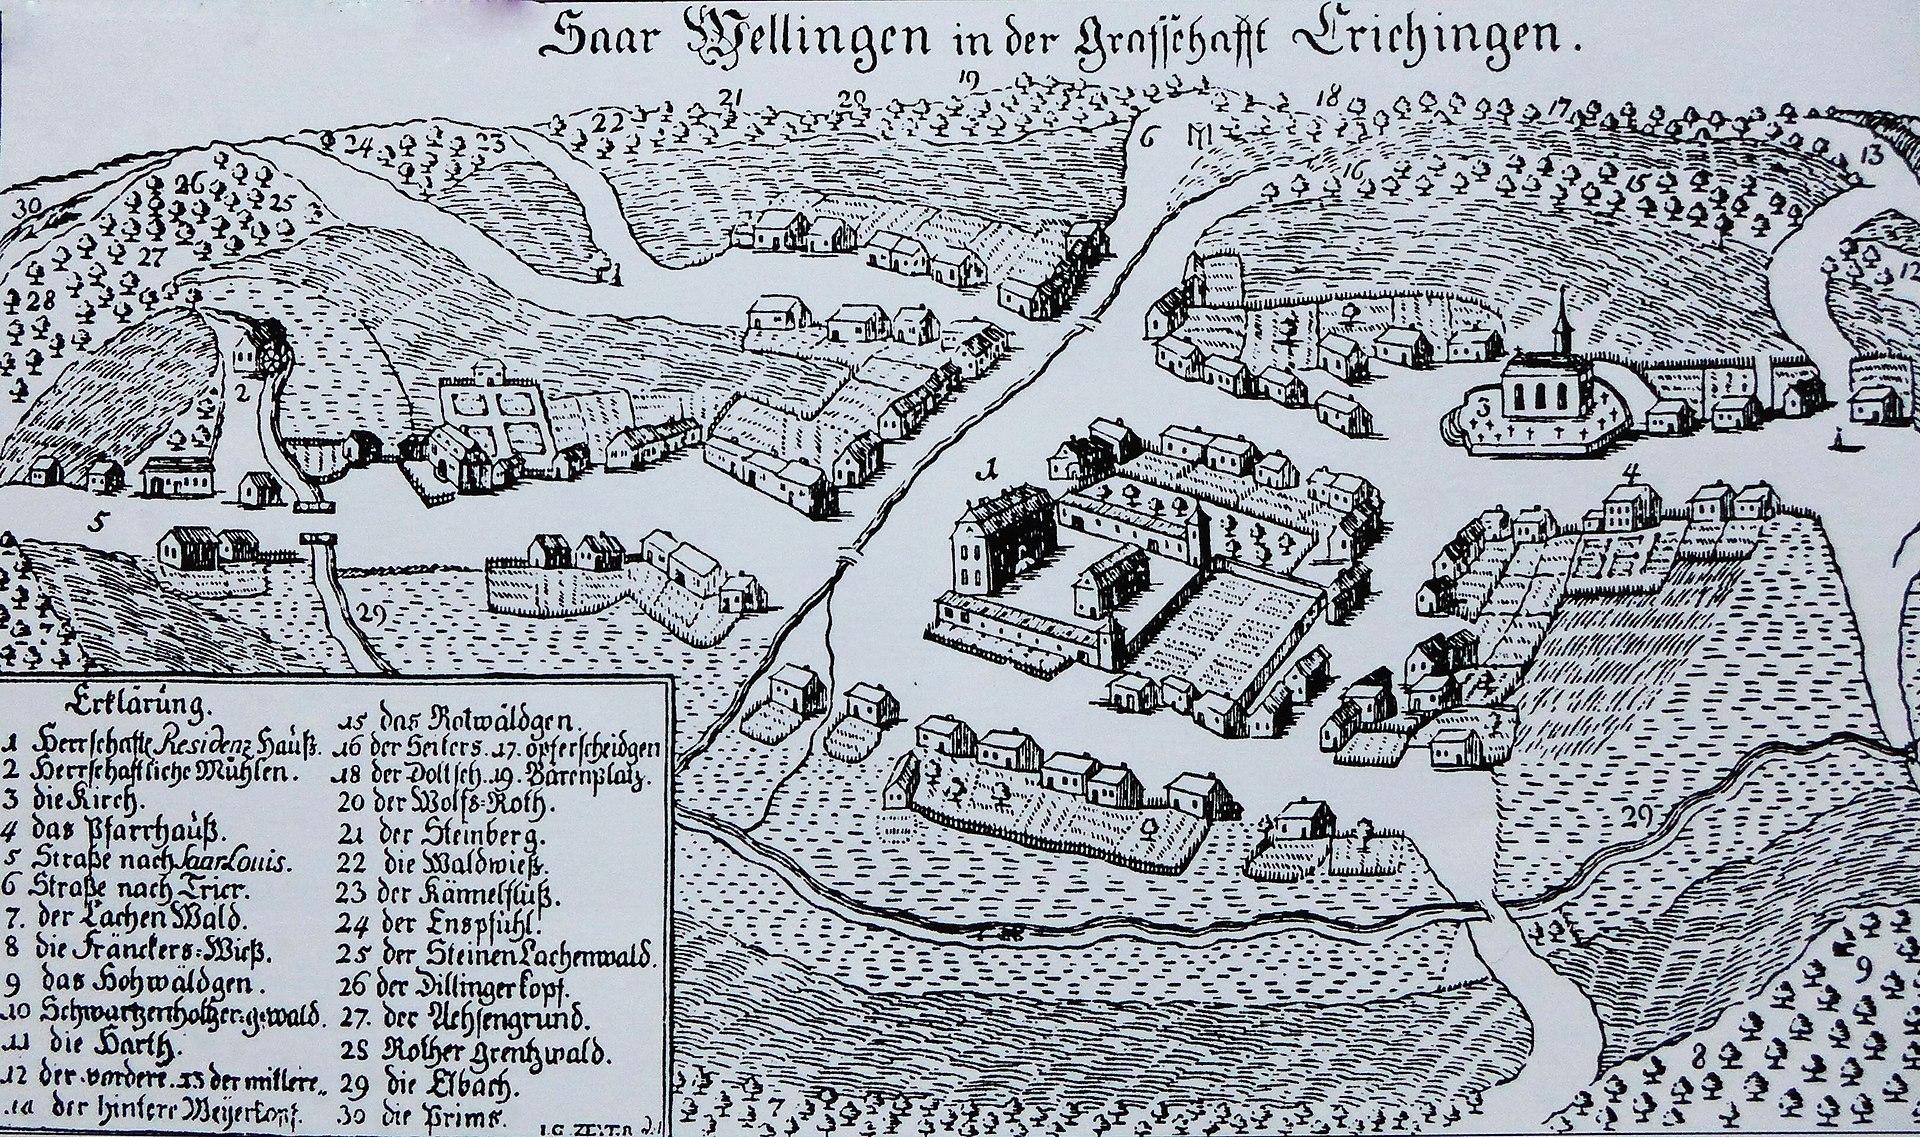 Saarwellingen1777L1150248 (5).jpg